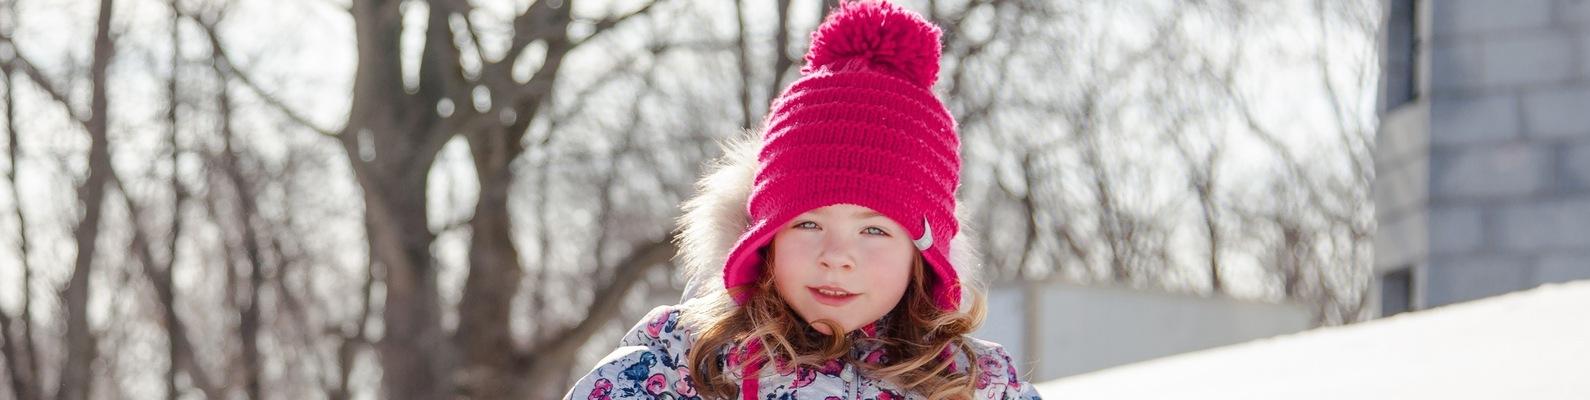 e3b0e6a48895 Детские комбинезоны Nano  Канада    ВКонтакте